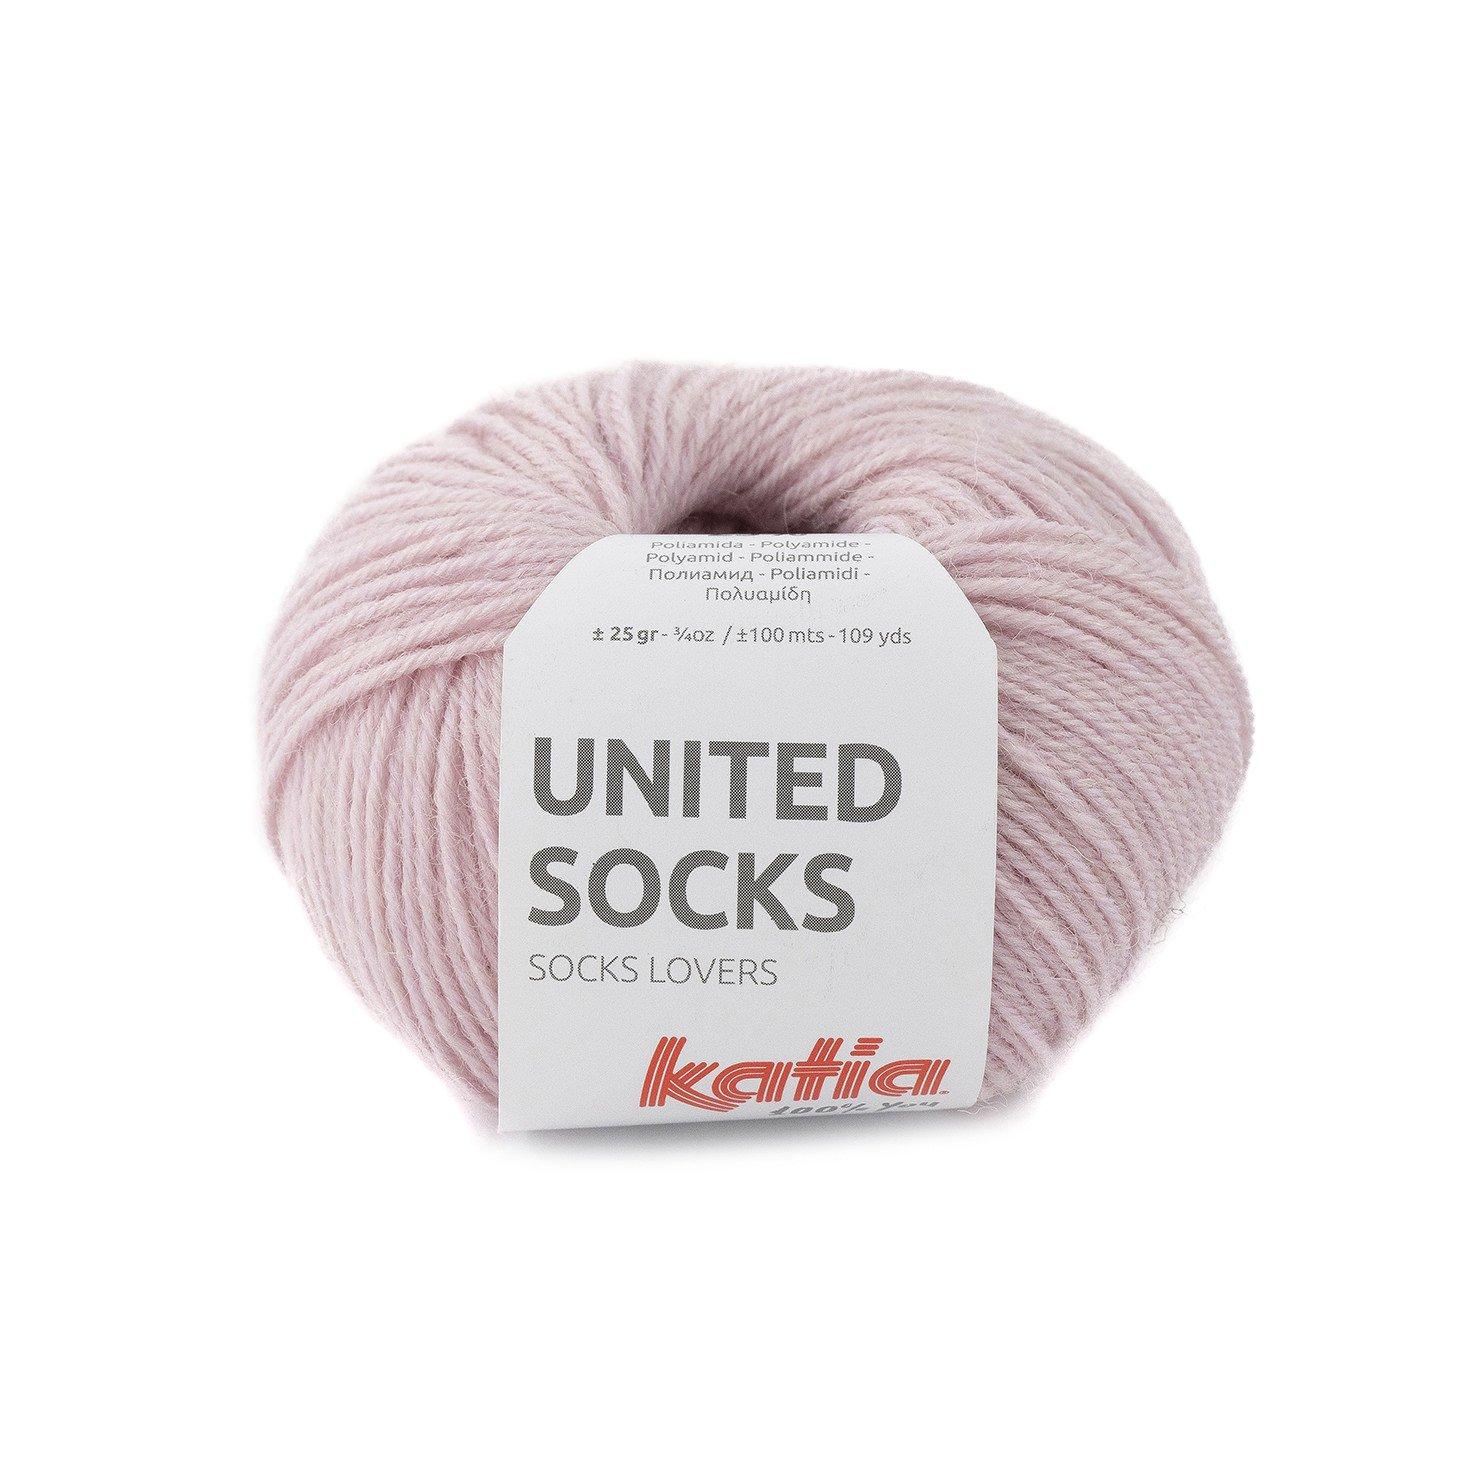 sokkenwol bleekrood